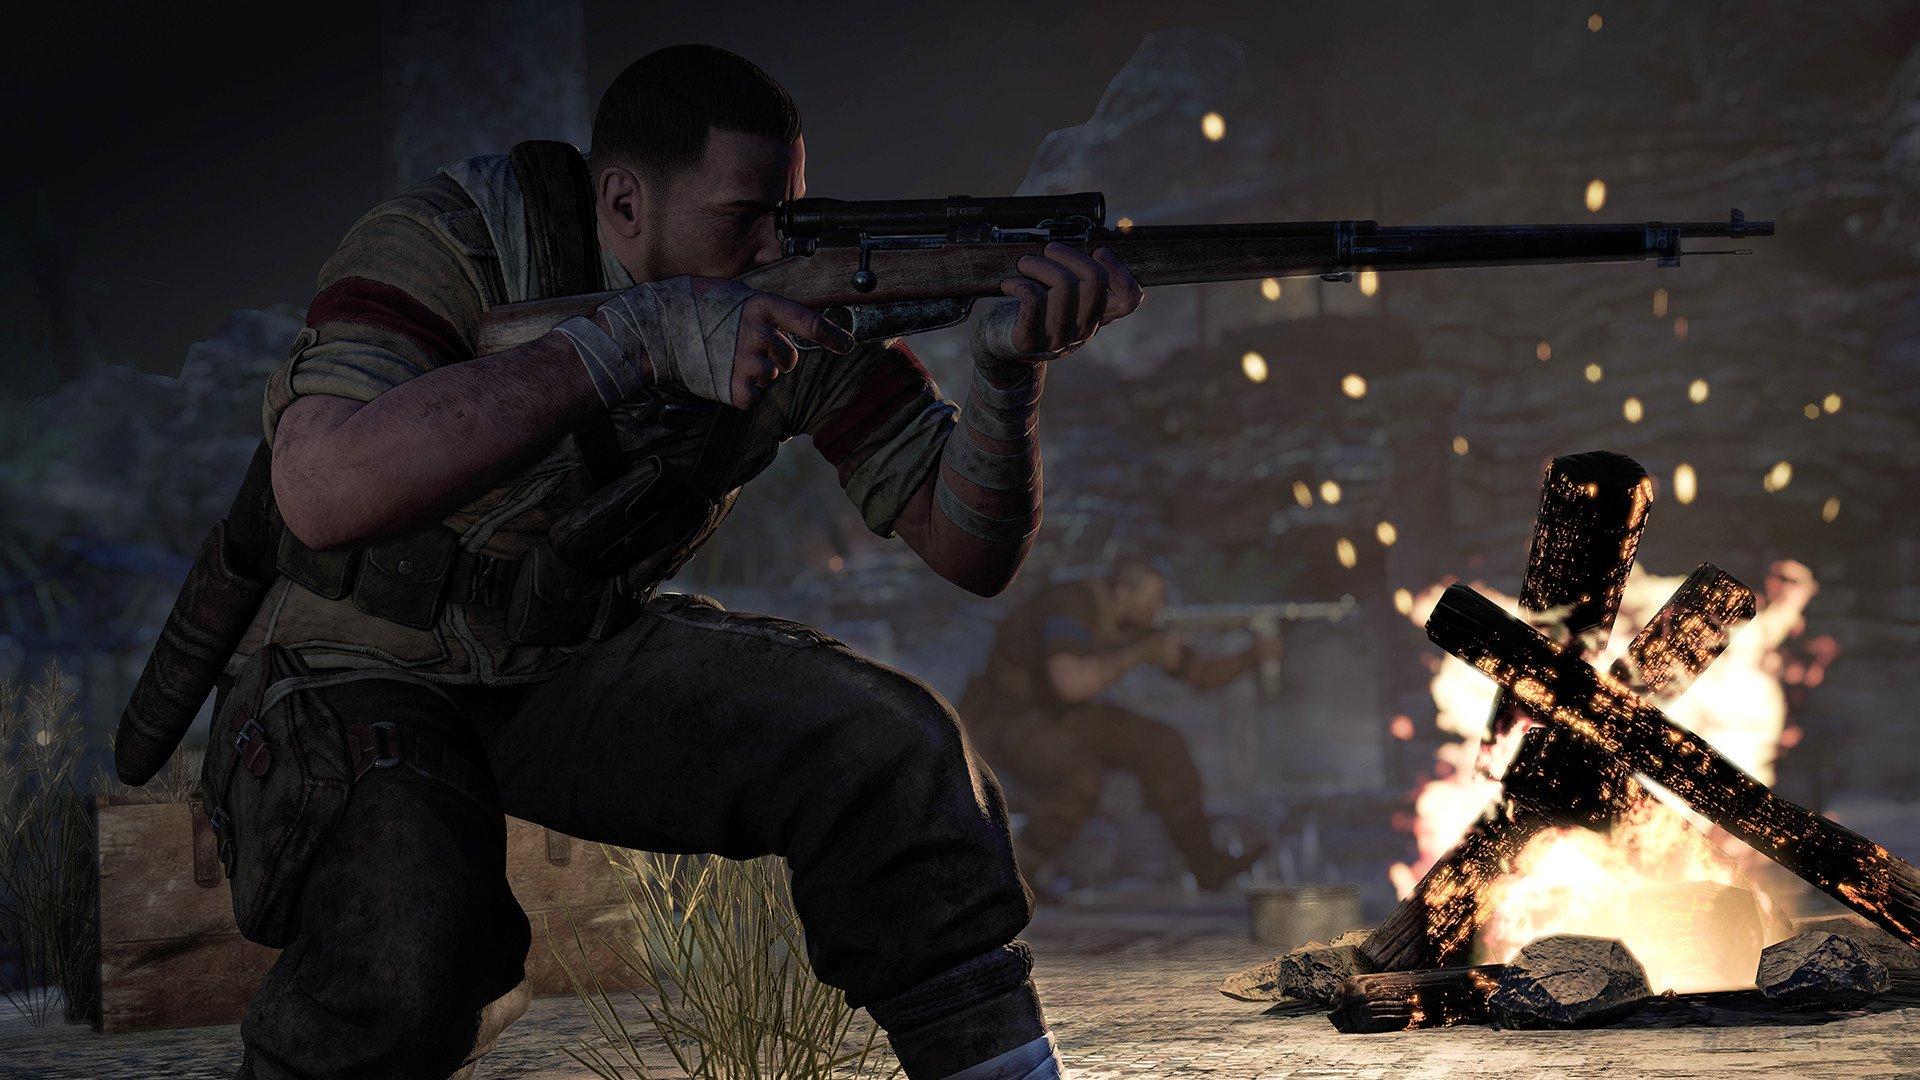 sniper elite 3 2537605 تصاویر جدیدی از Sniper Elite 3 منتشر شد : بیابان گردی در آفریقا